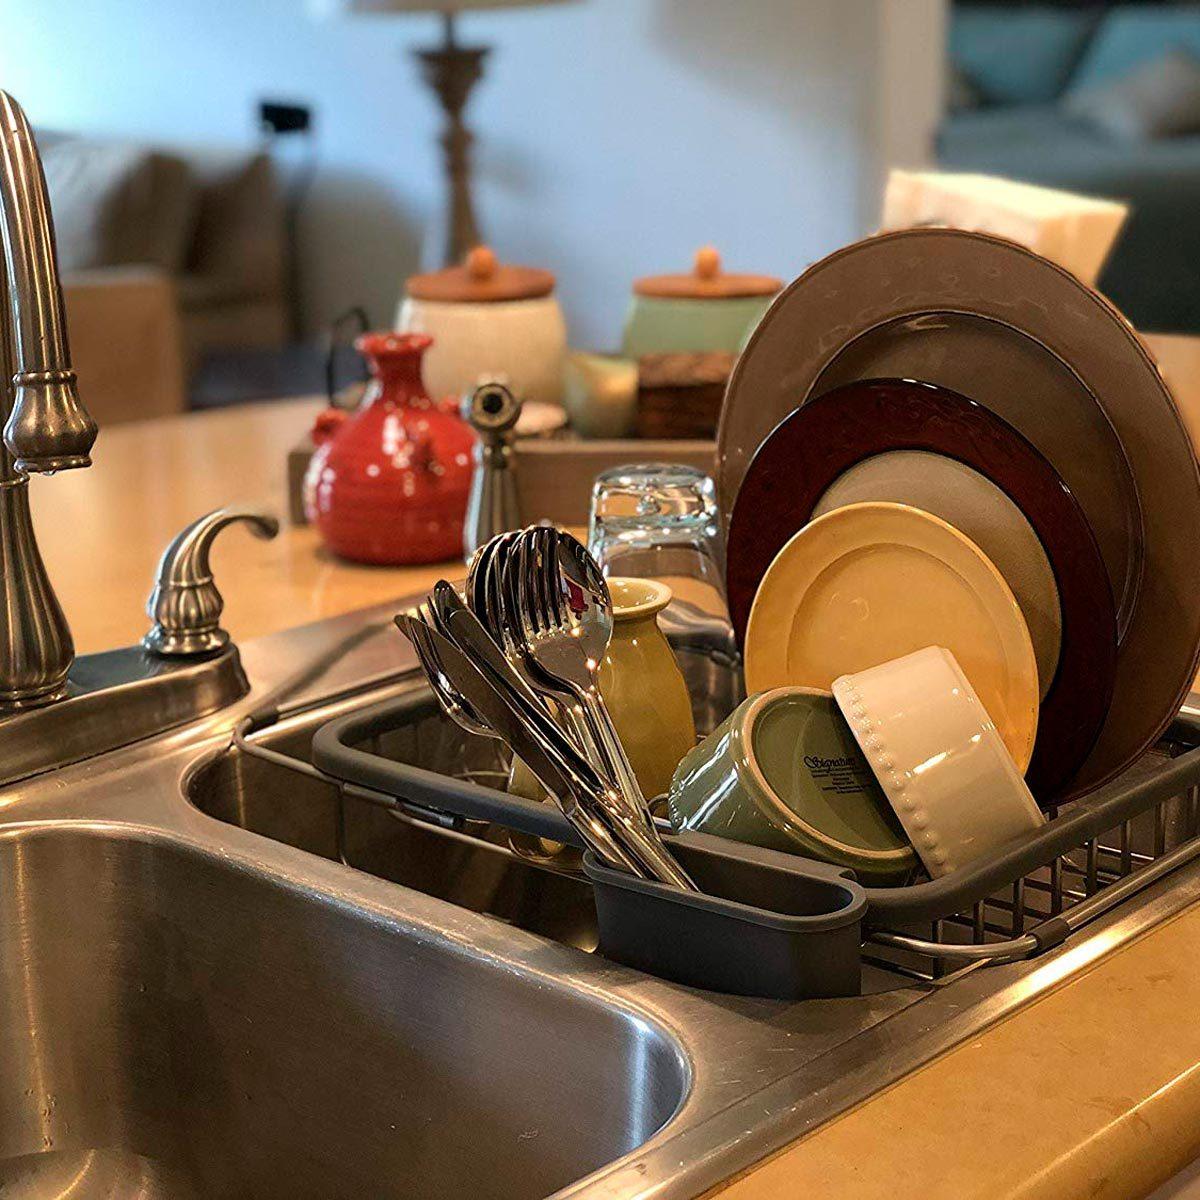 Expandable Dish Drying Rack